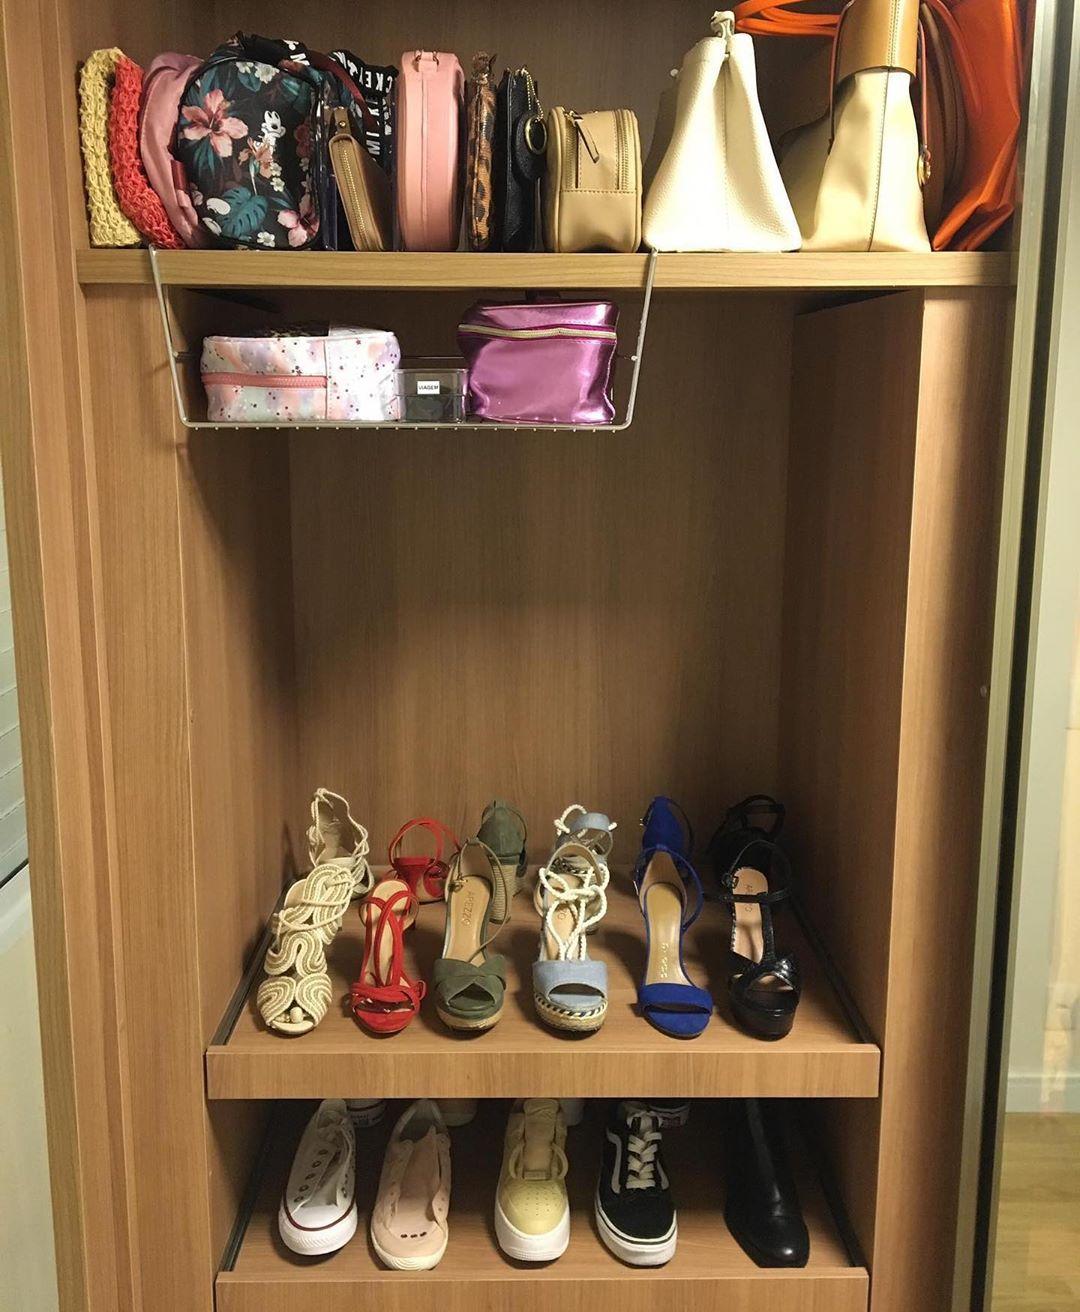 cestos para organizar bolsas no armario